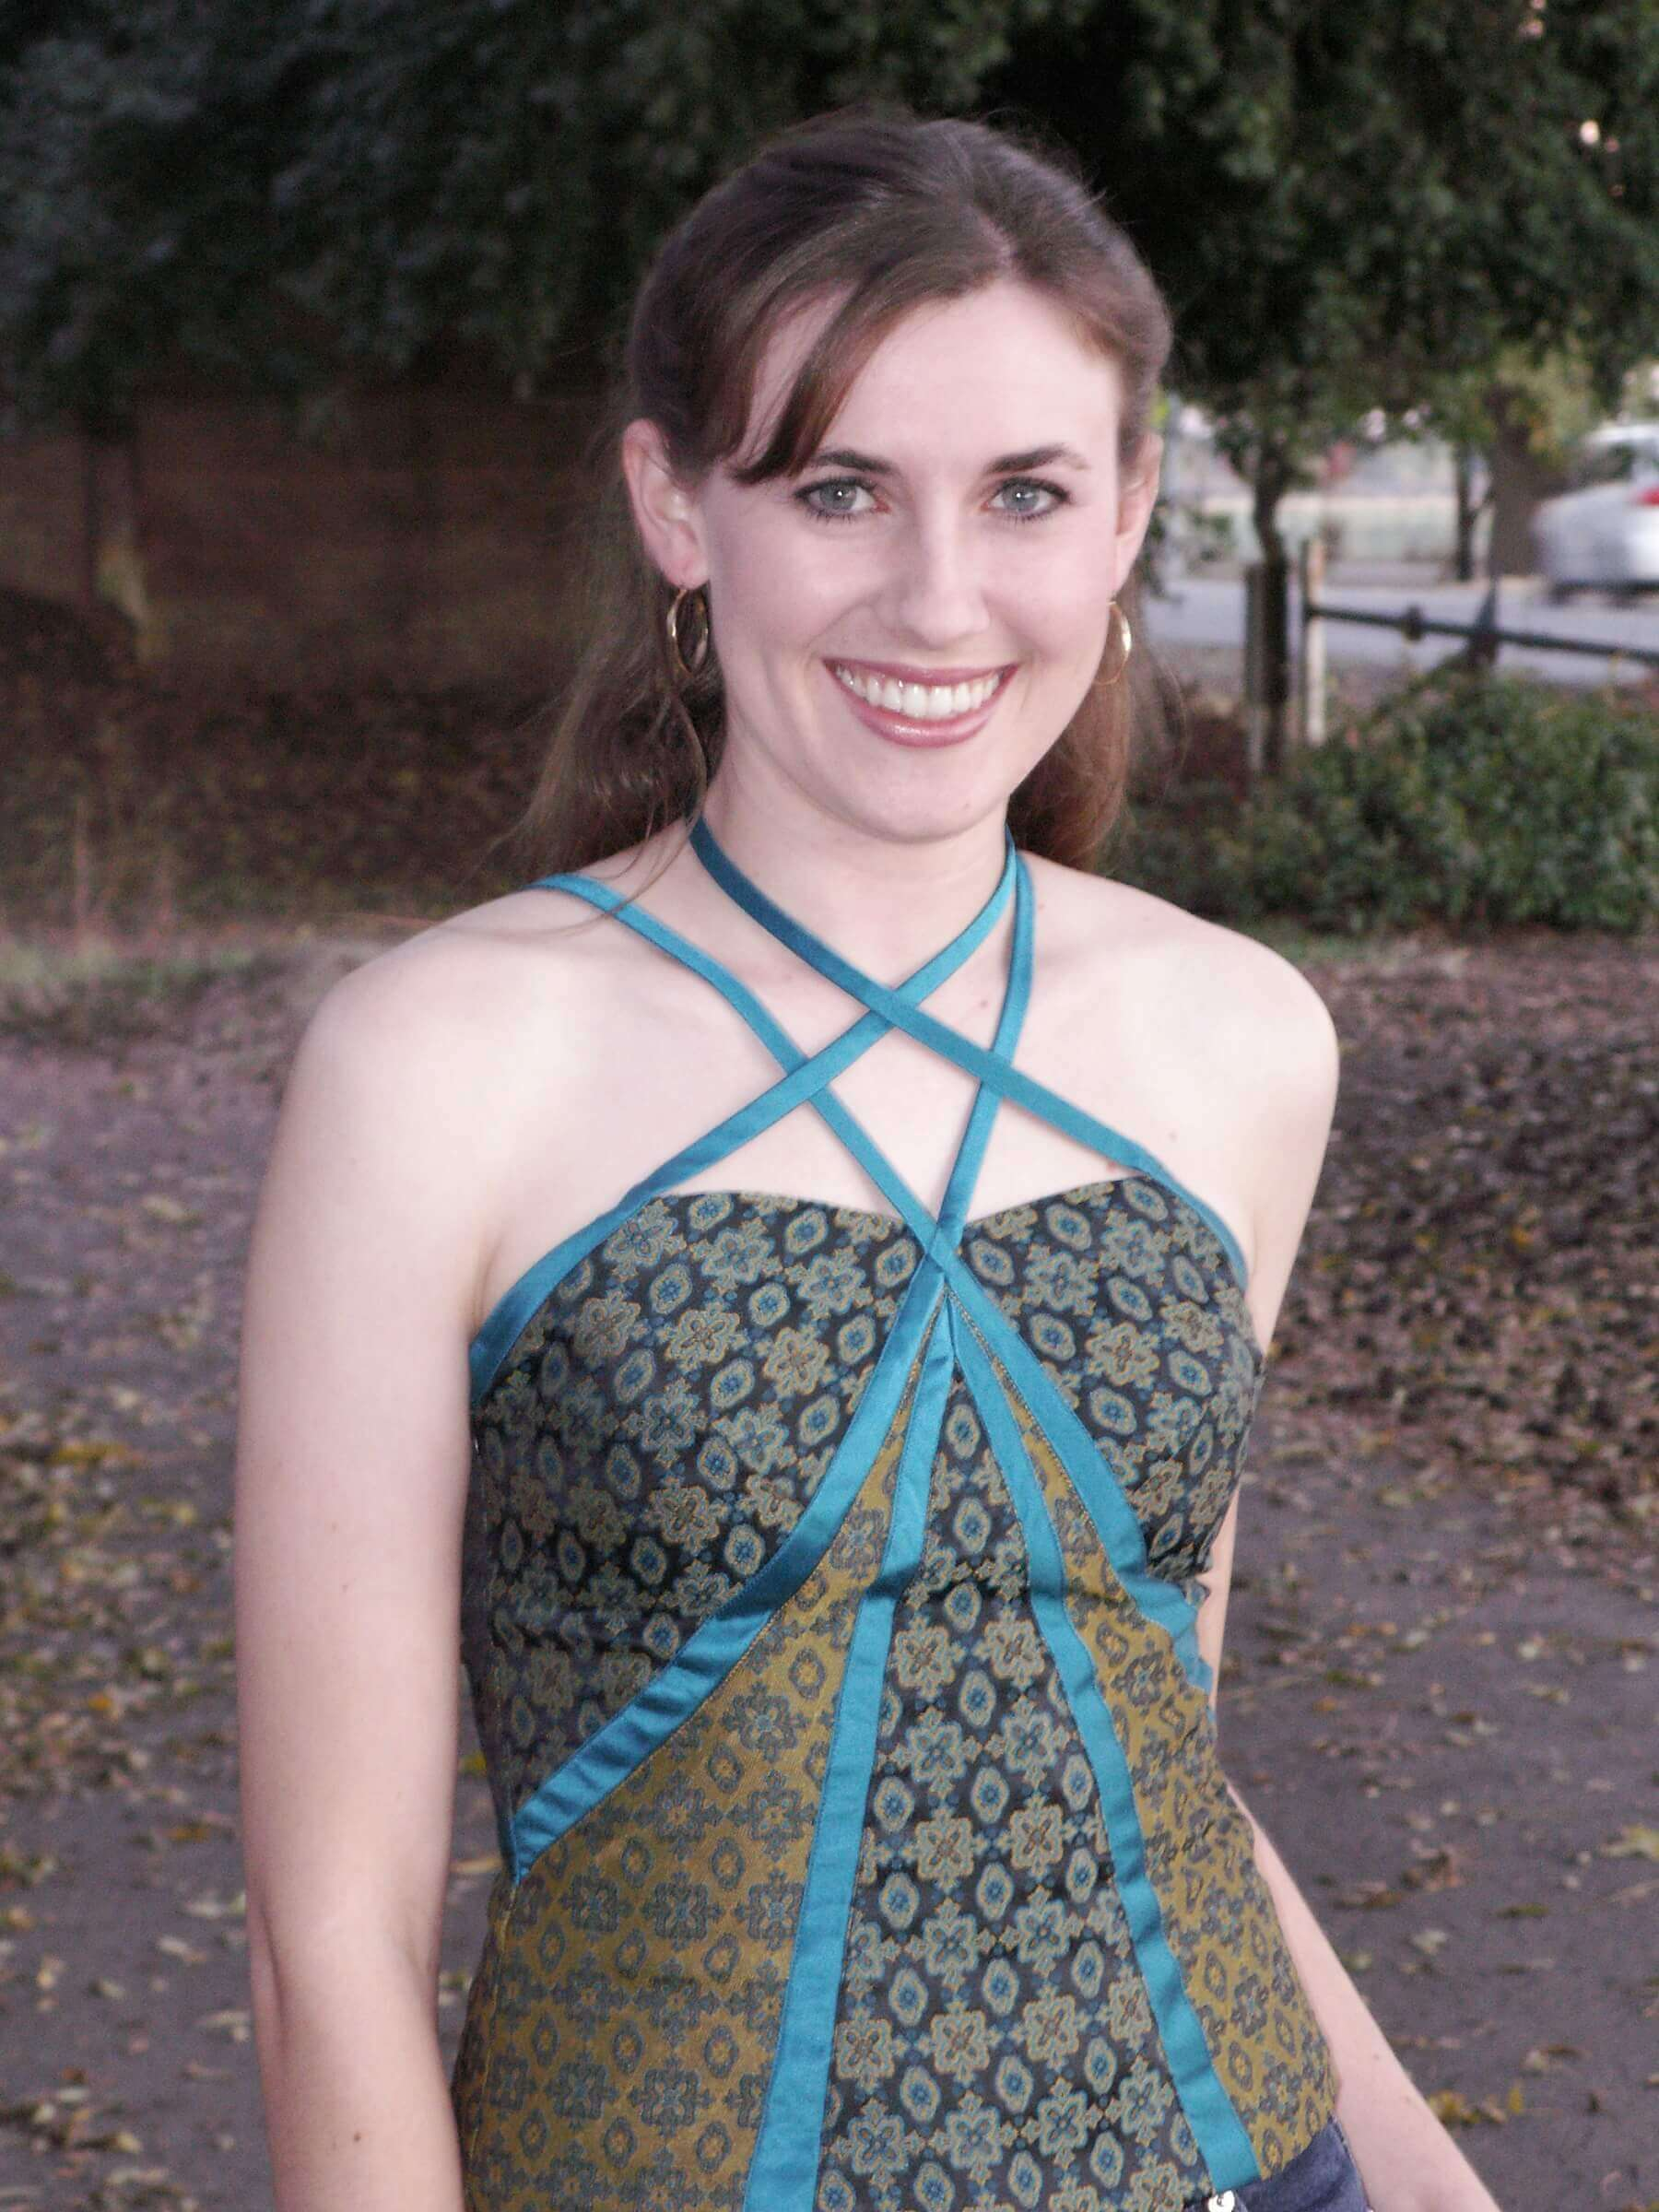 custom made green brocade shirt - by Rebecca Wendlandt